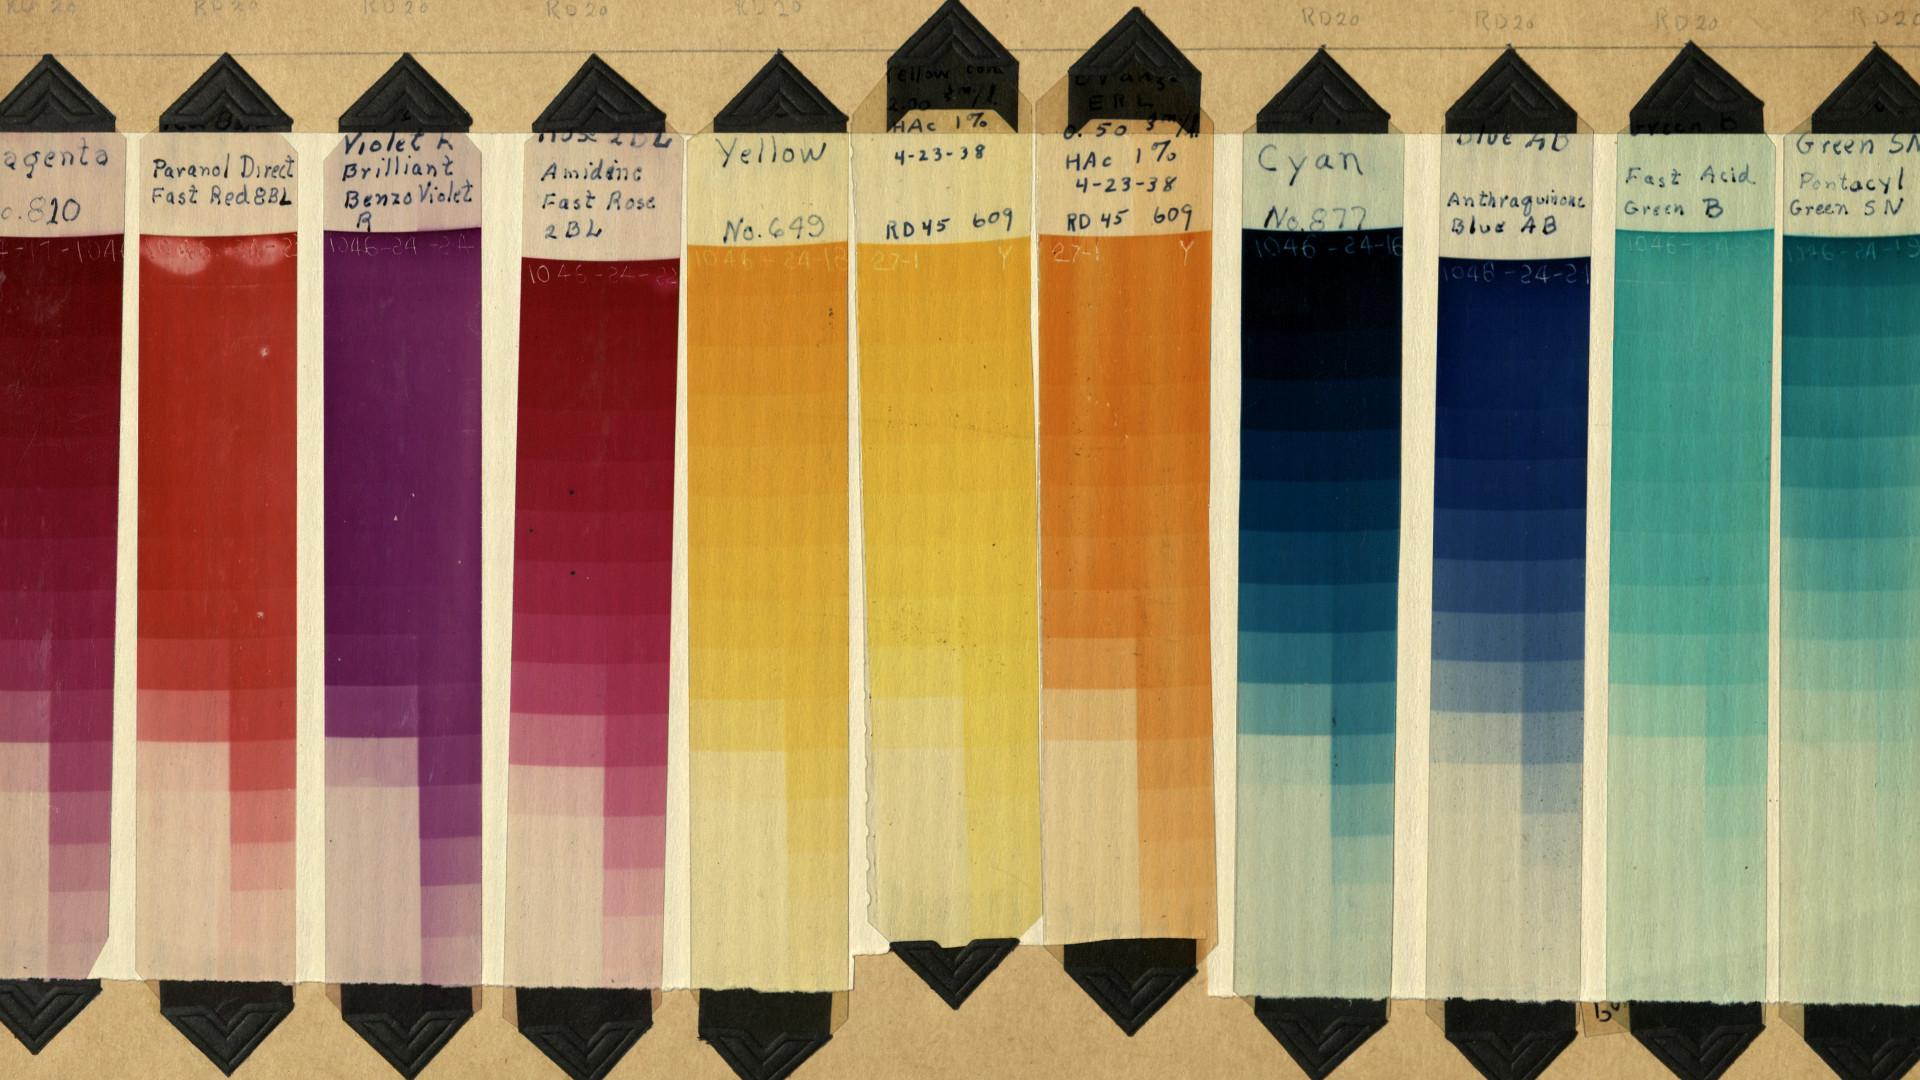 technicolor online research archive george eastman museum